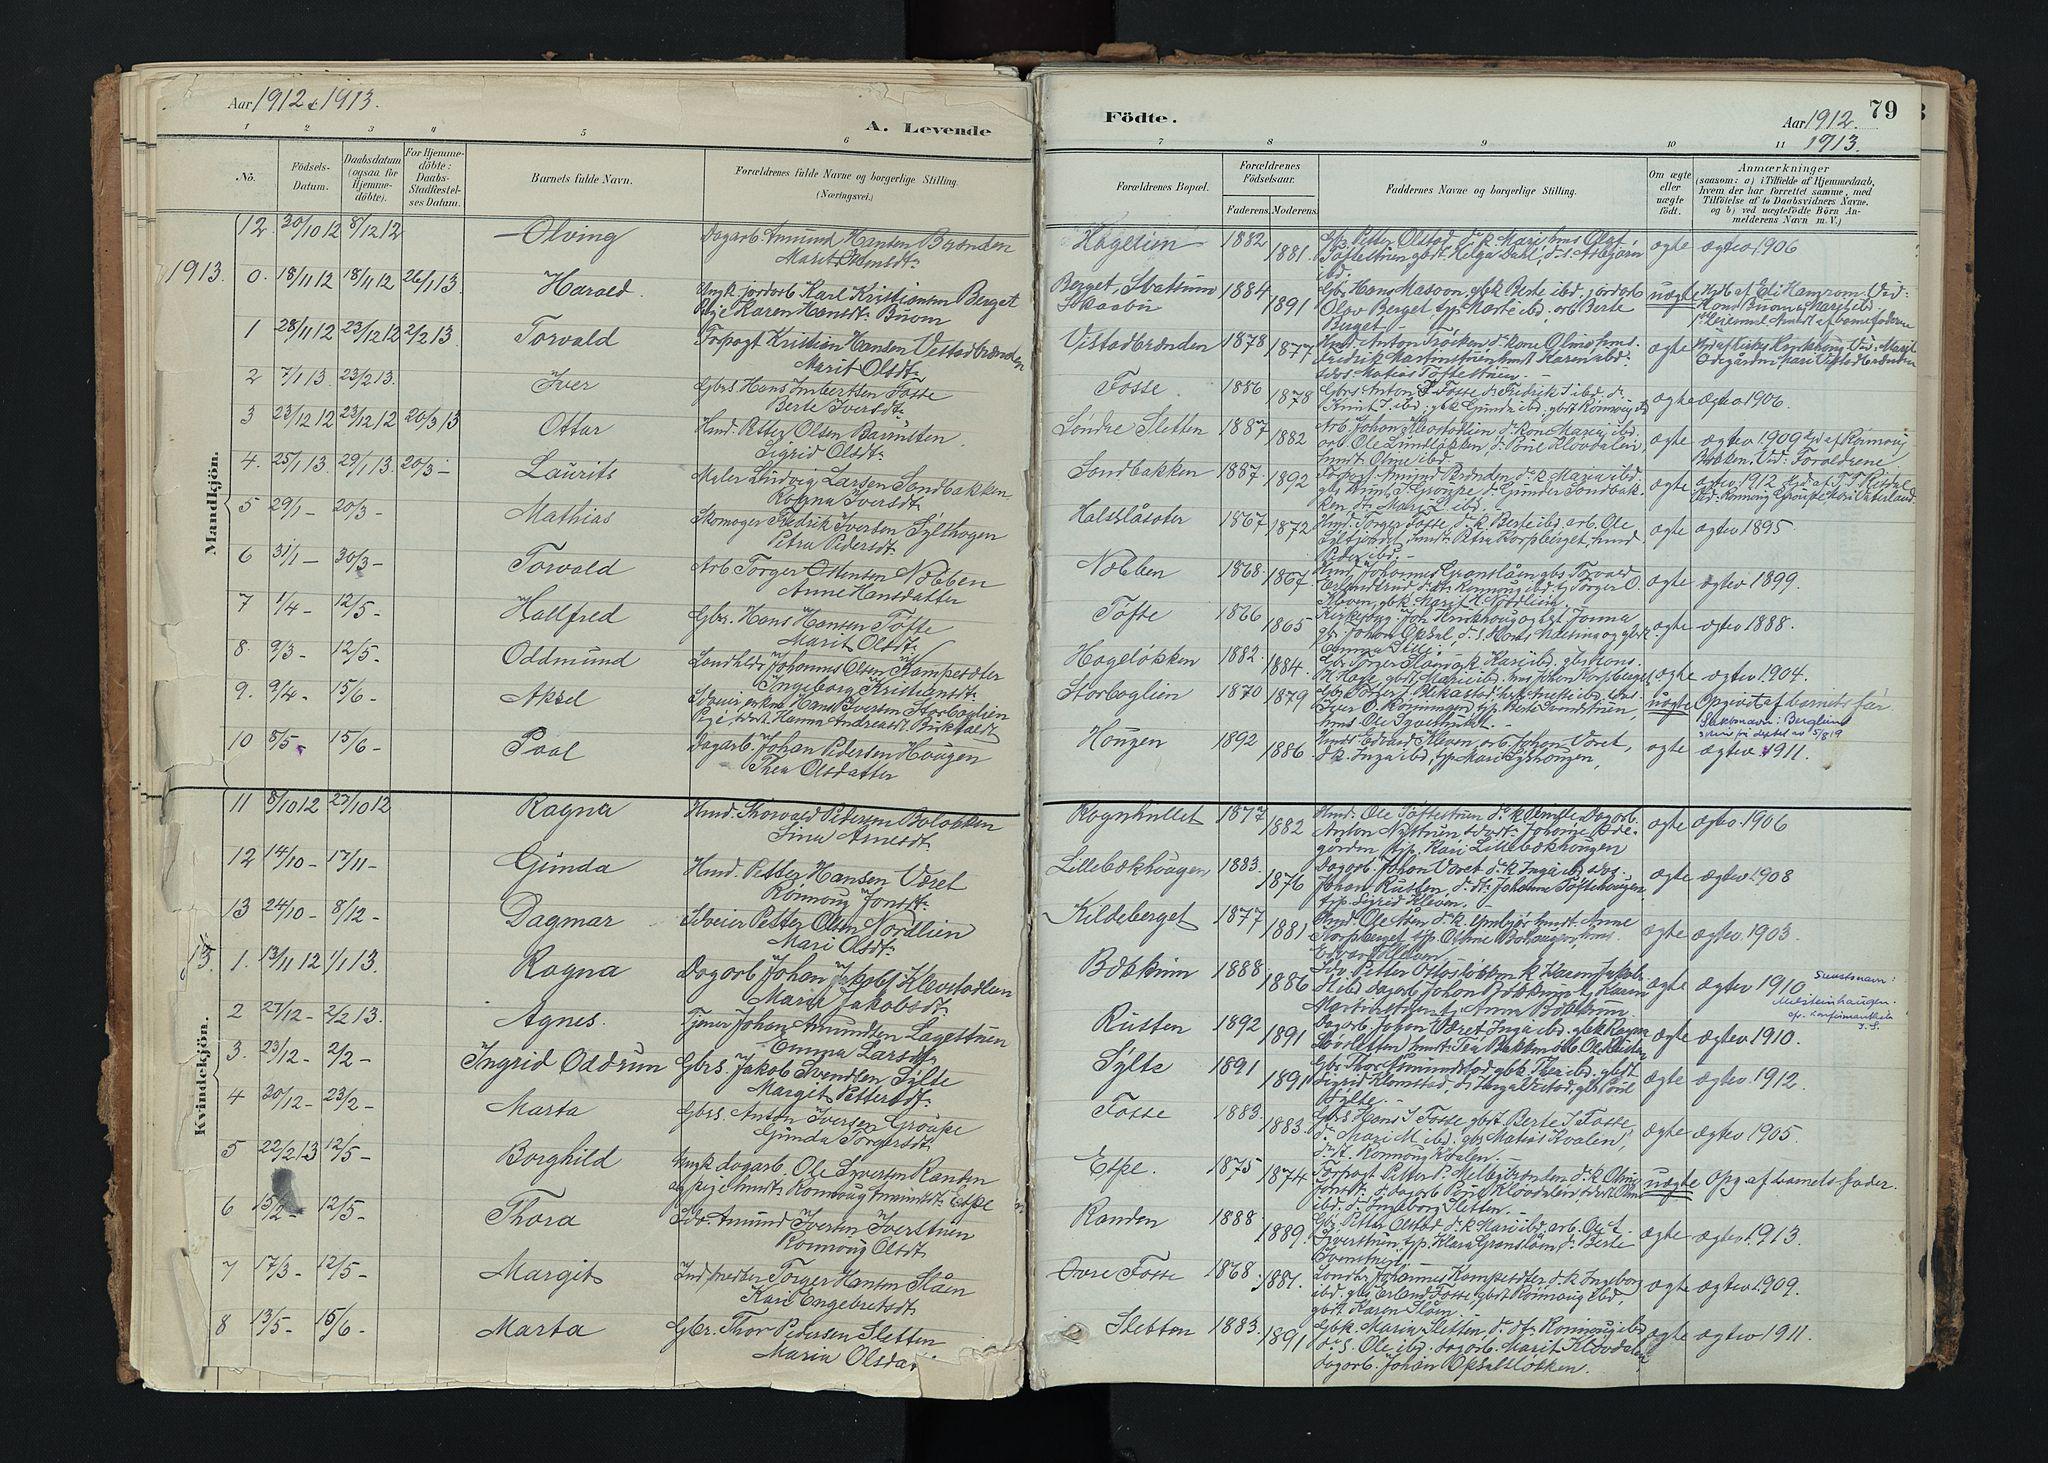 SAH, Nord-Fron prestekontor, Ministerialbok nr. 5, 1884-1914, s. 79